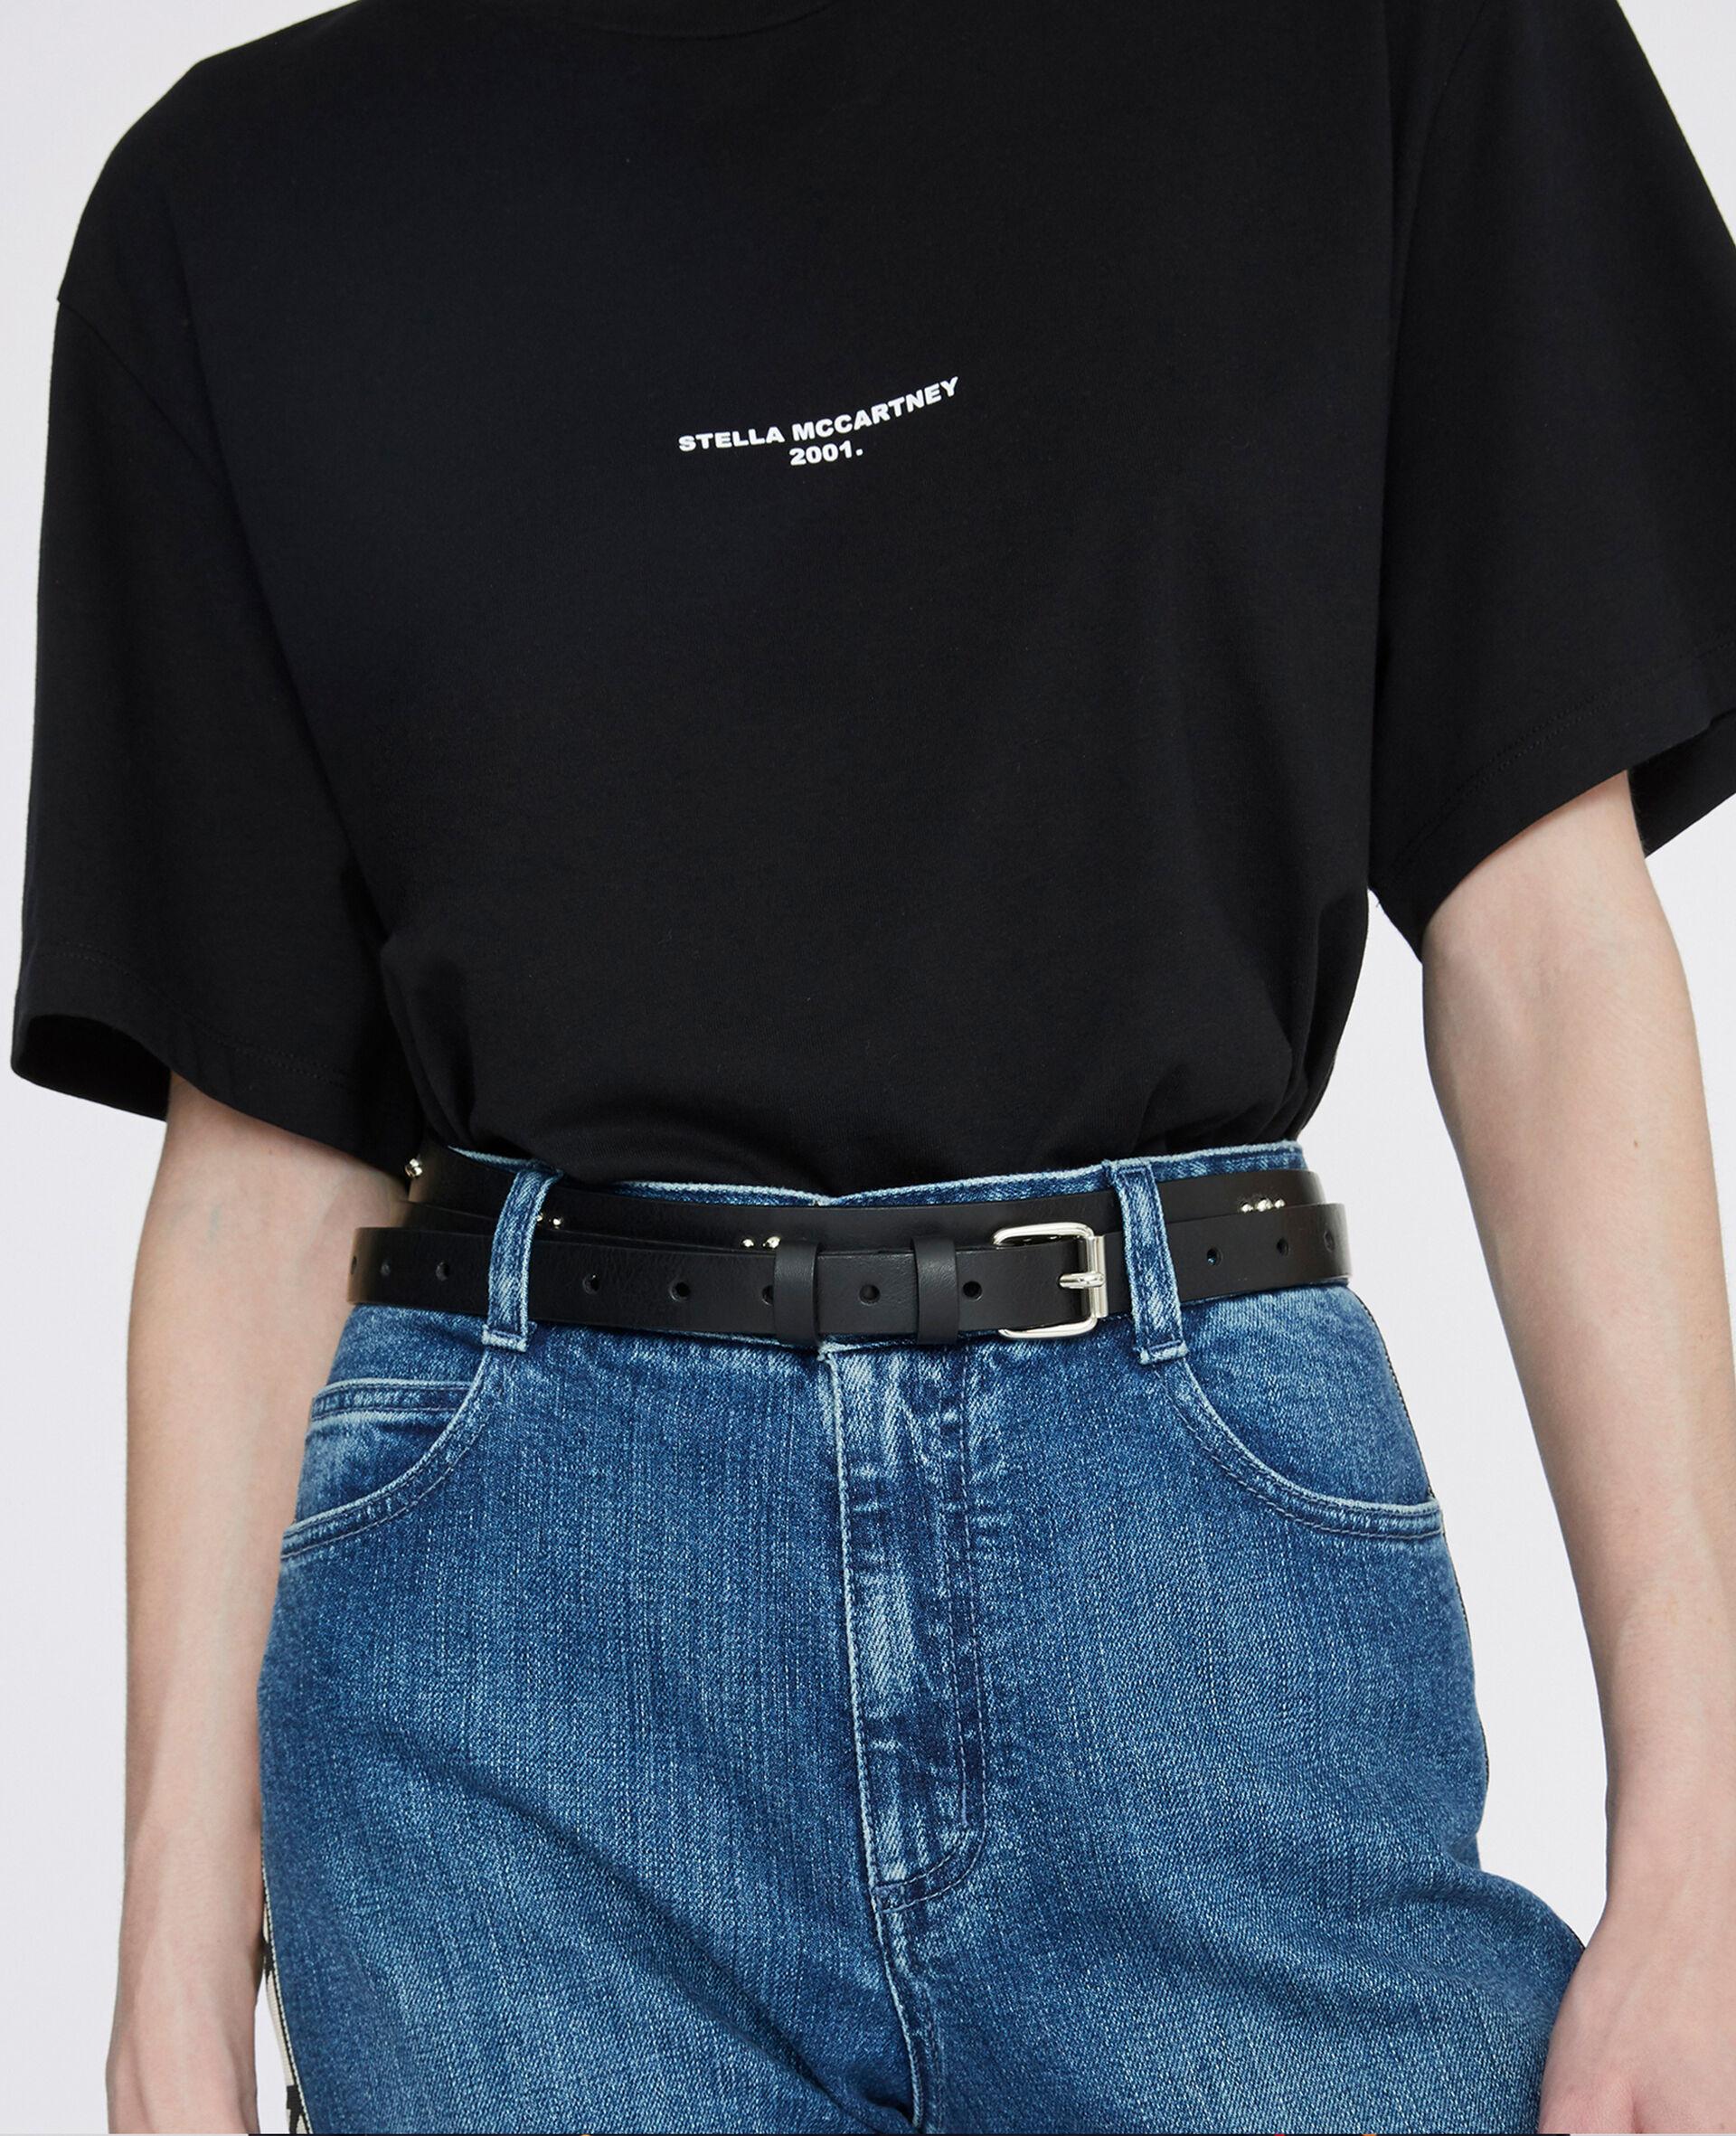 Stella McCartney 2001. T-Shirt-Schwarz-large image number 3